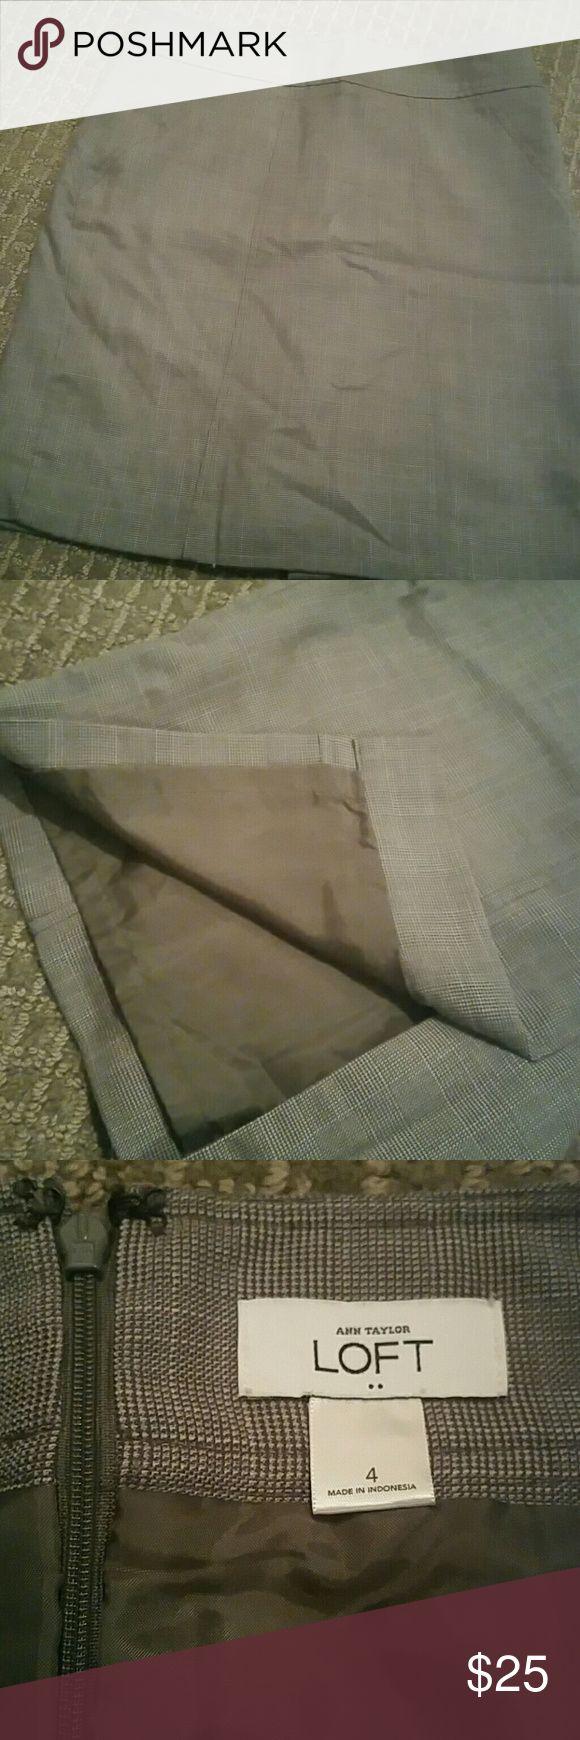 Fine line plaid lined pencil skirt Ann Taylor Loft | Fine line plaid lined pencil skirt LOFT Skirts Pencil